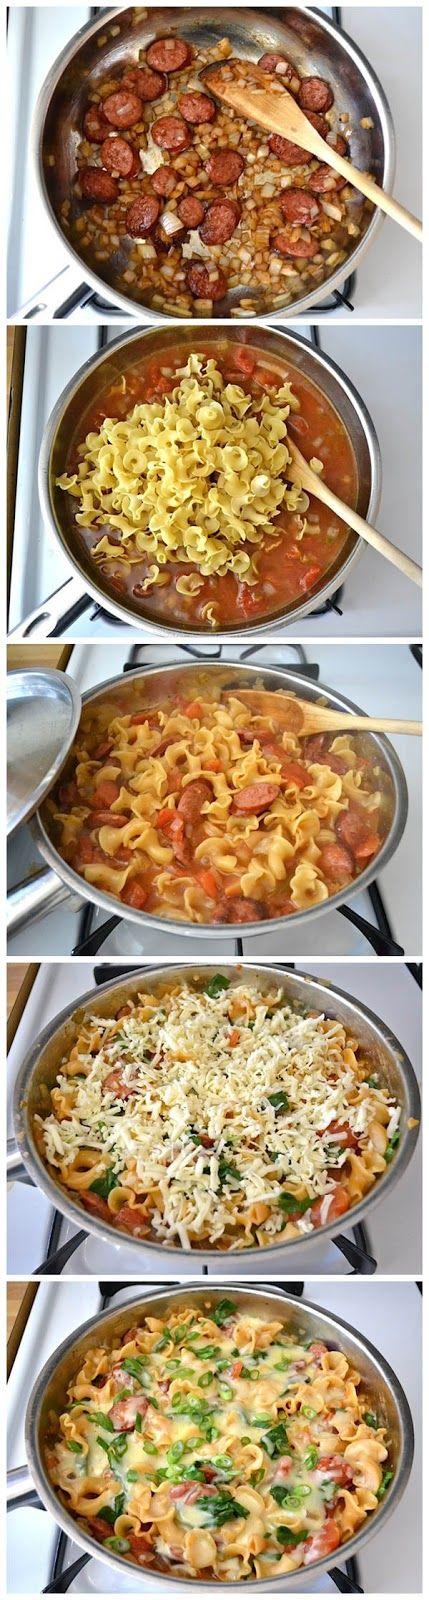 creamy spinach & sausage pasta